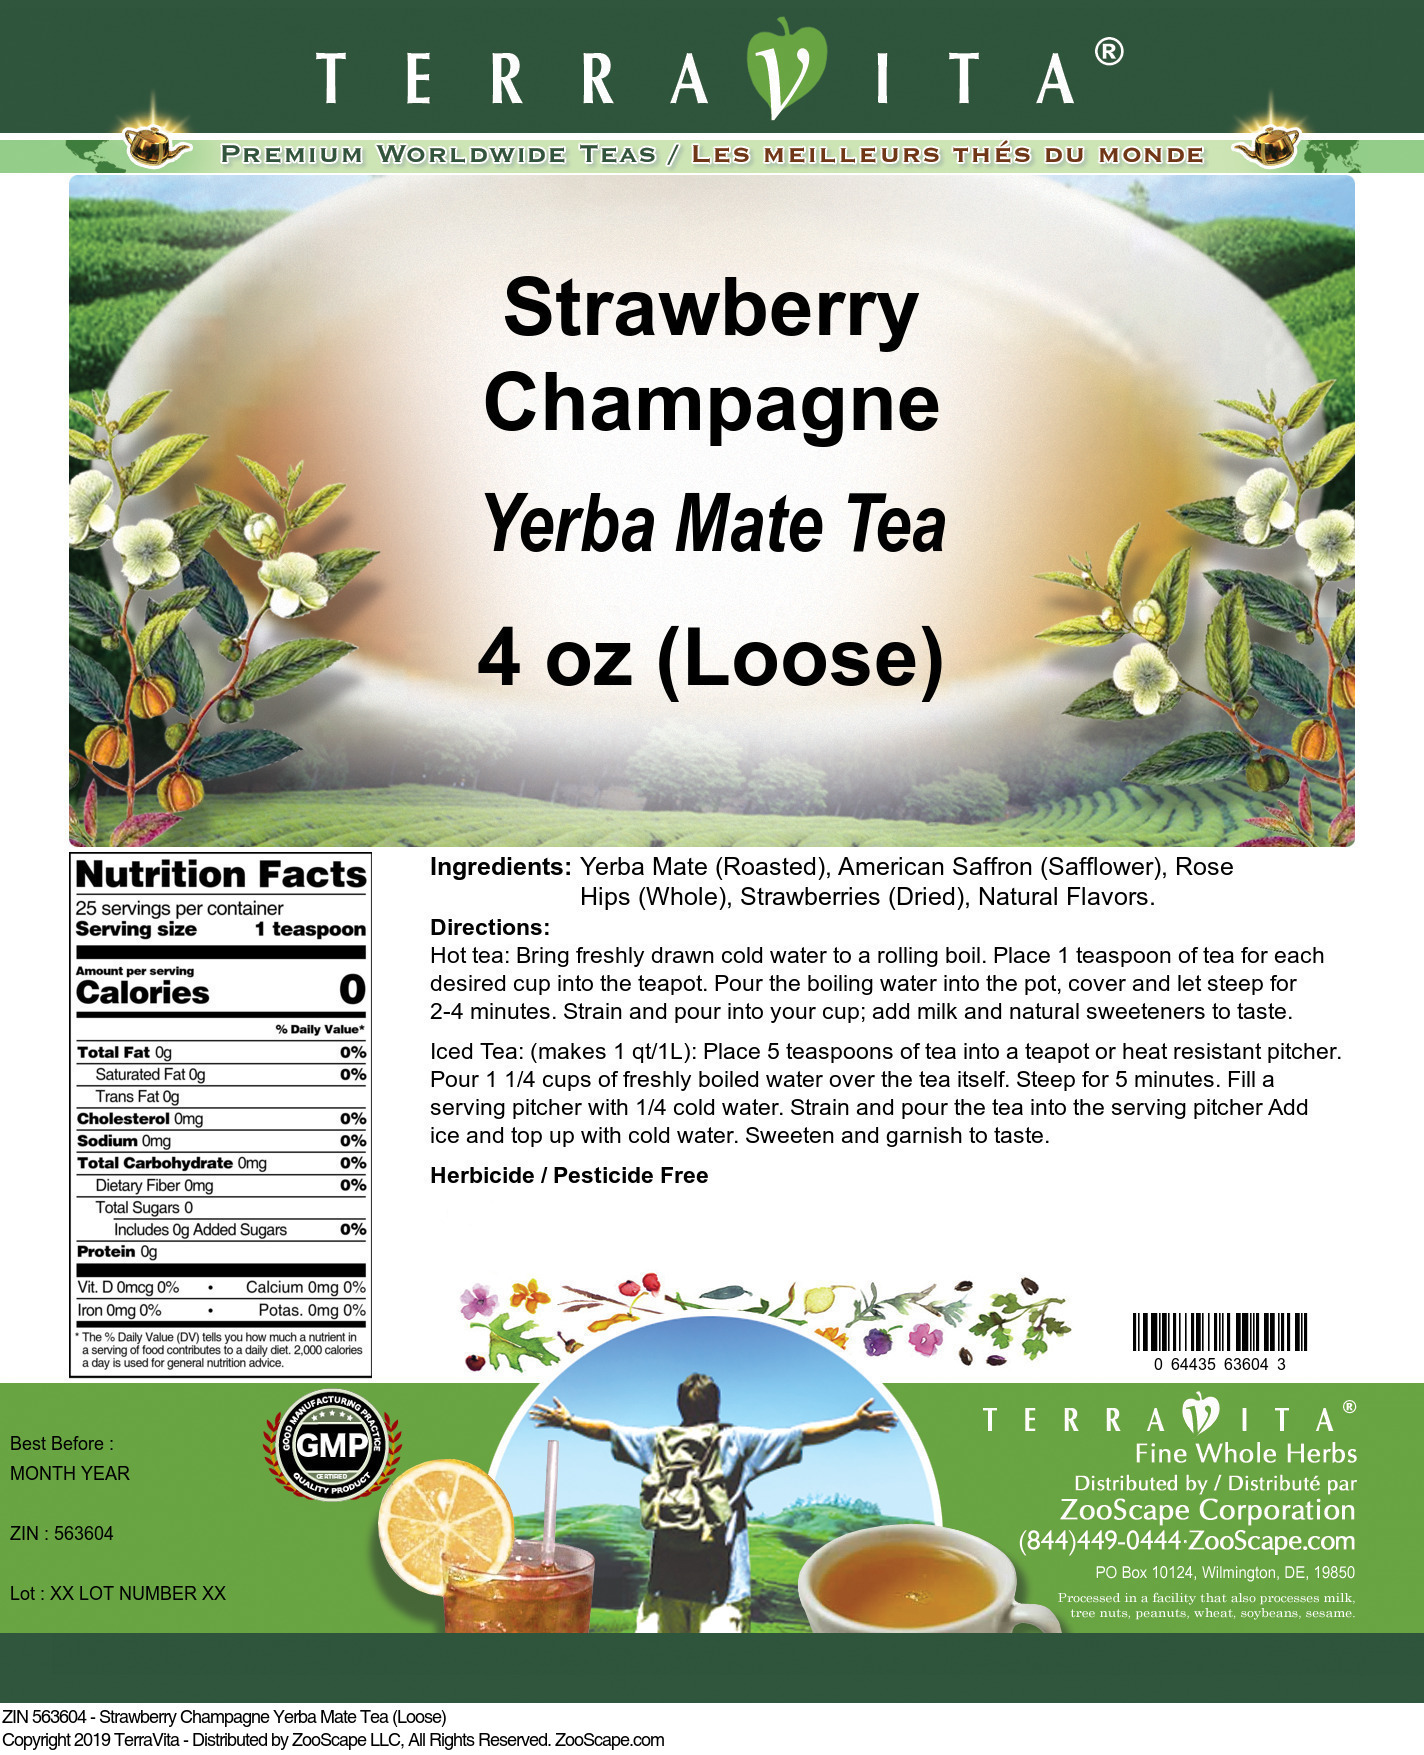 Strawberry Champagne Yerba Mate